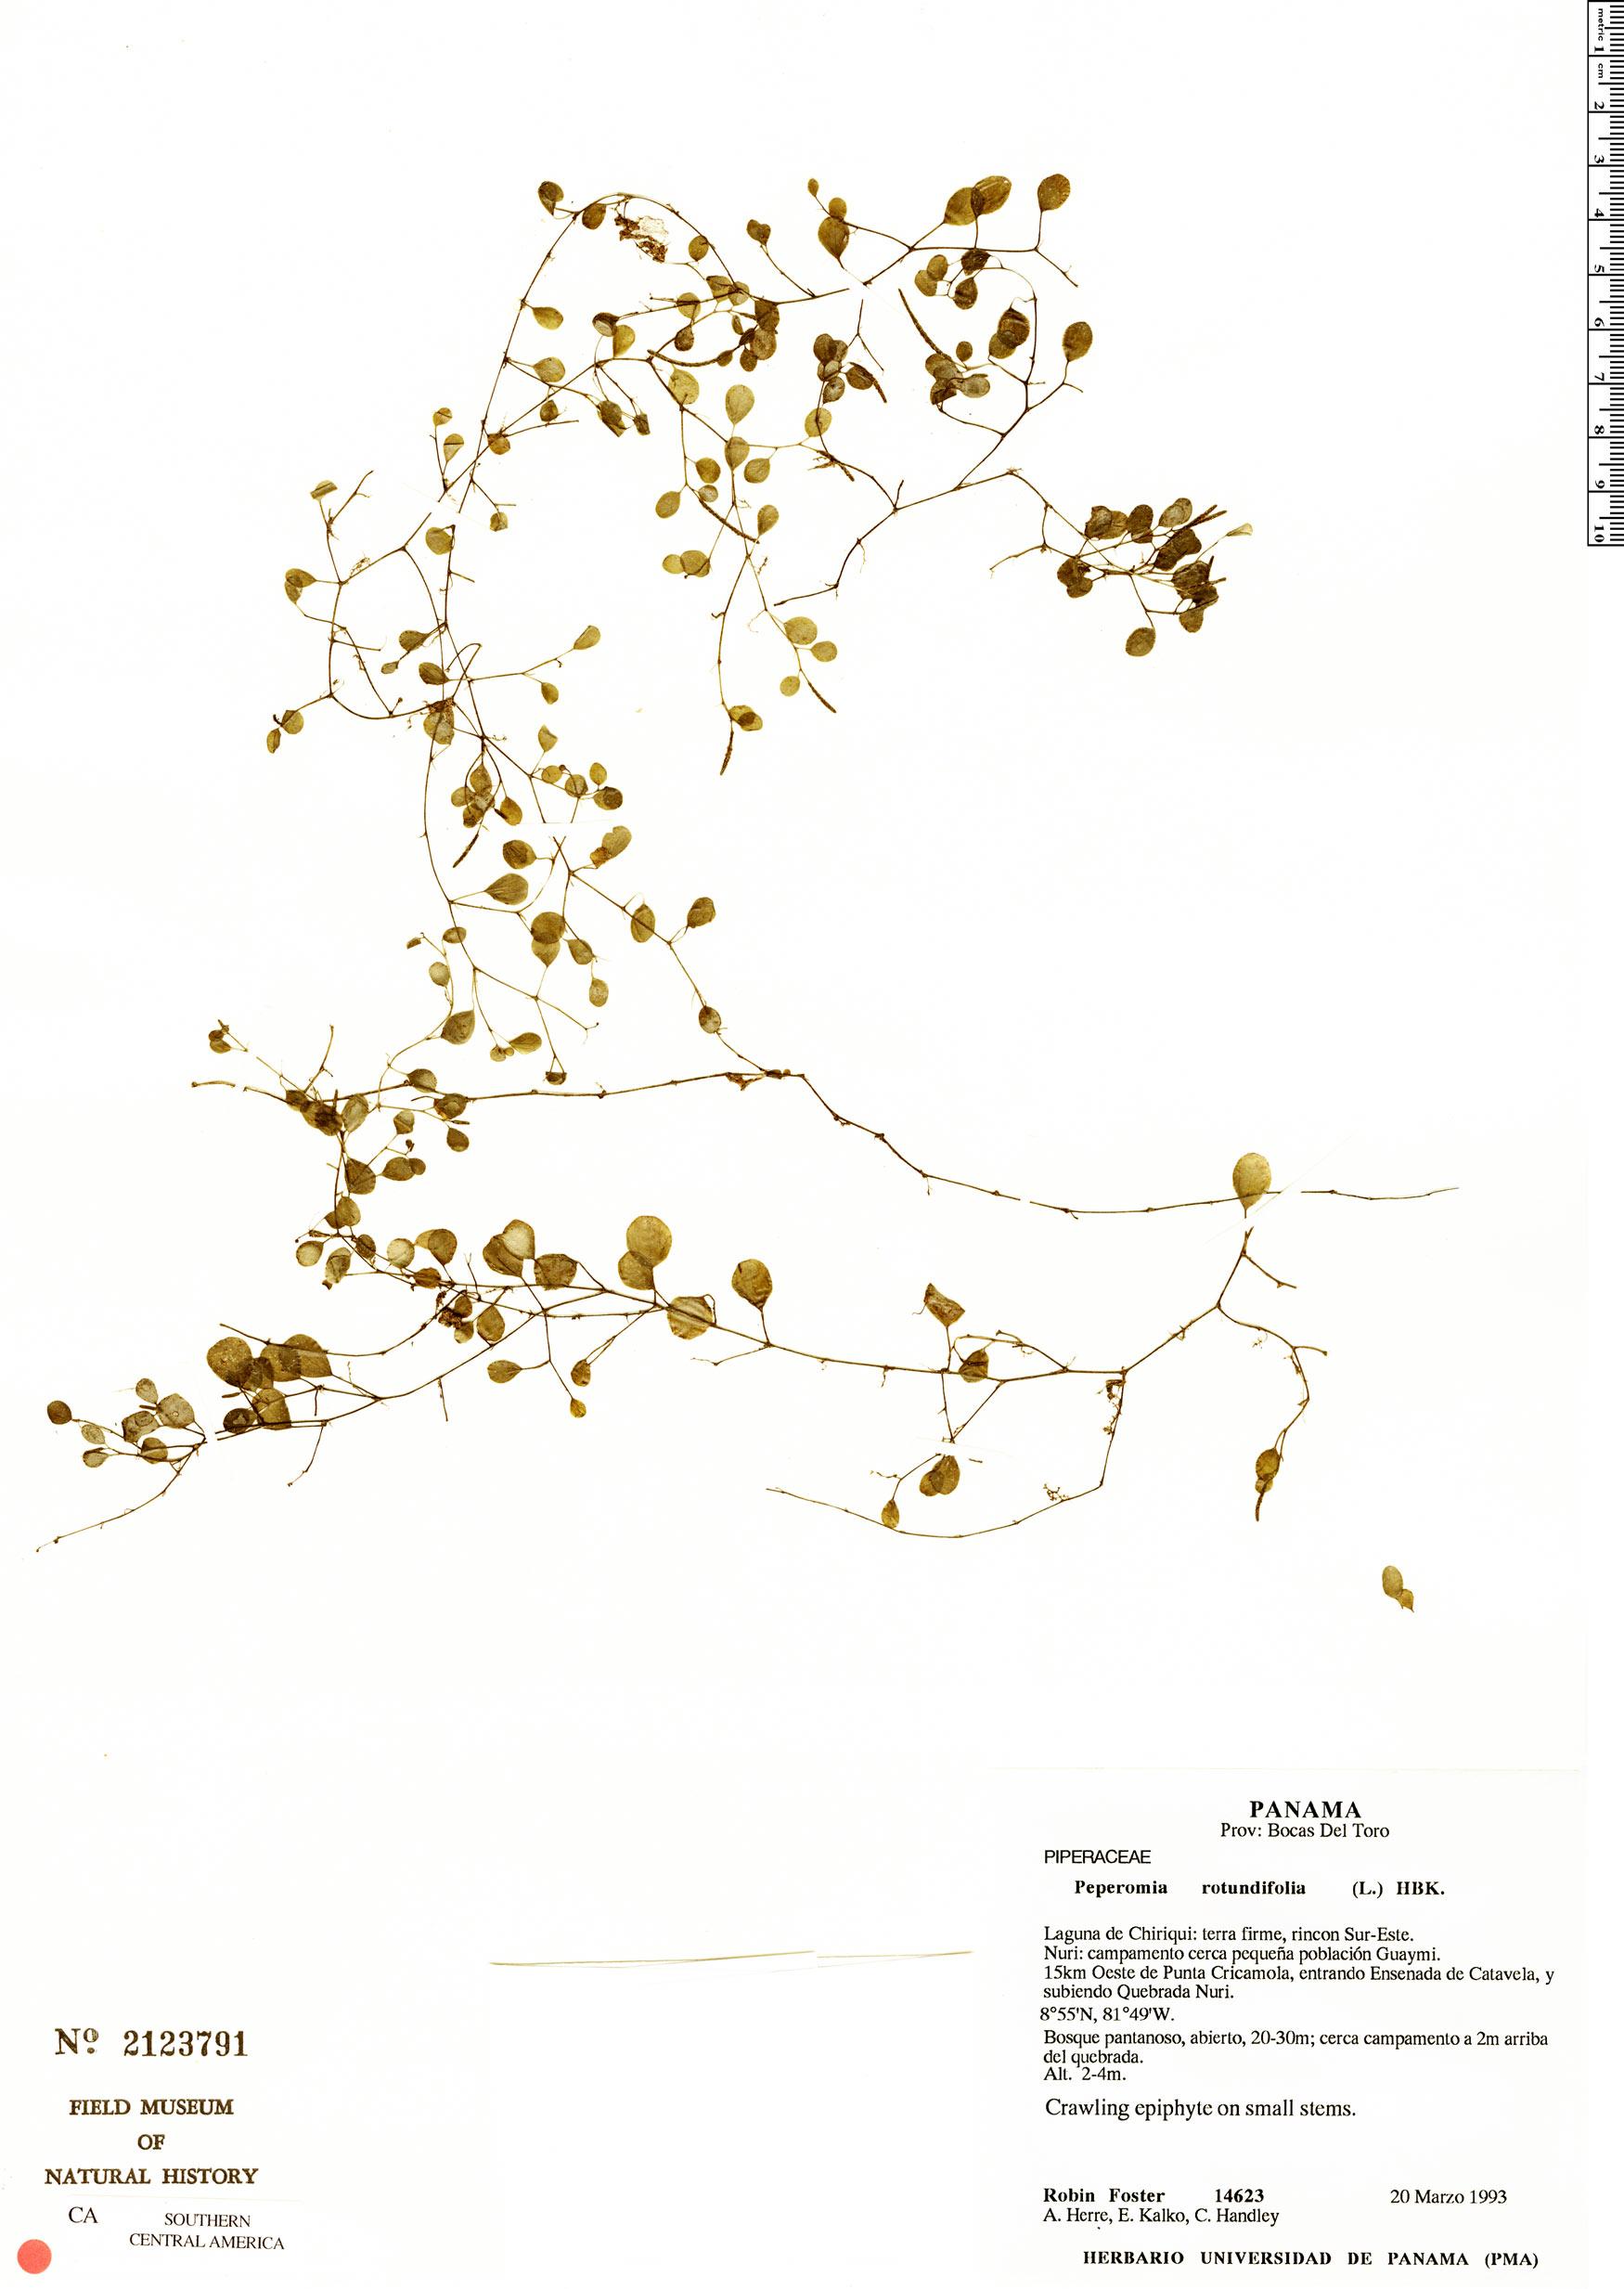 Specimen: Peperomia rotundifolia